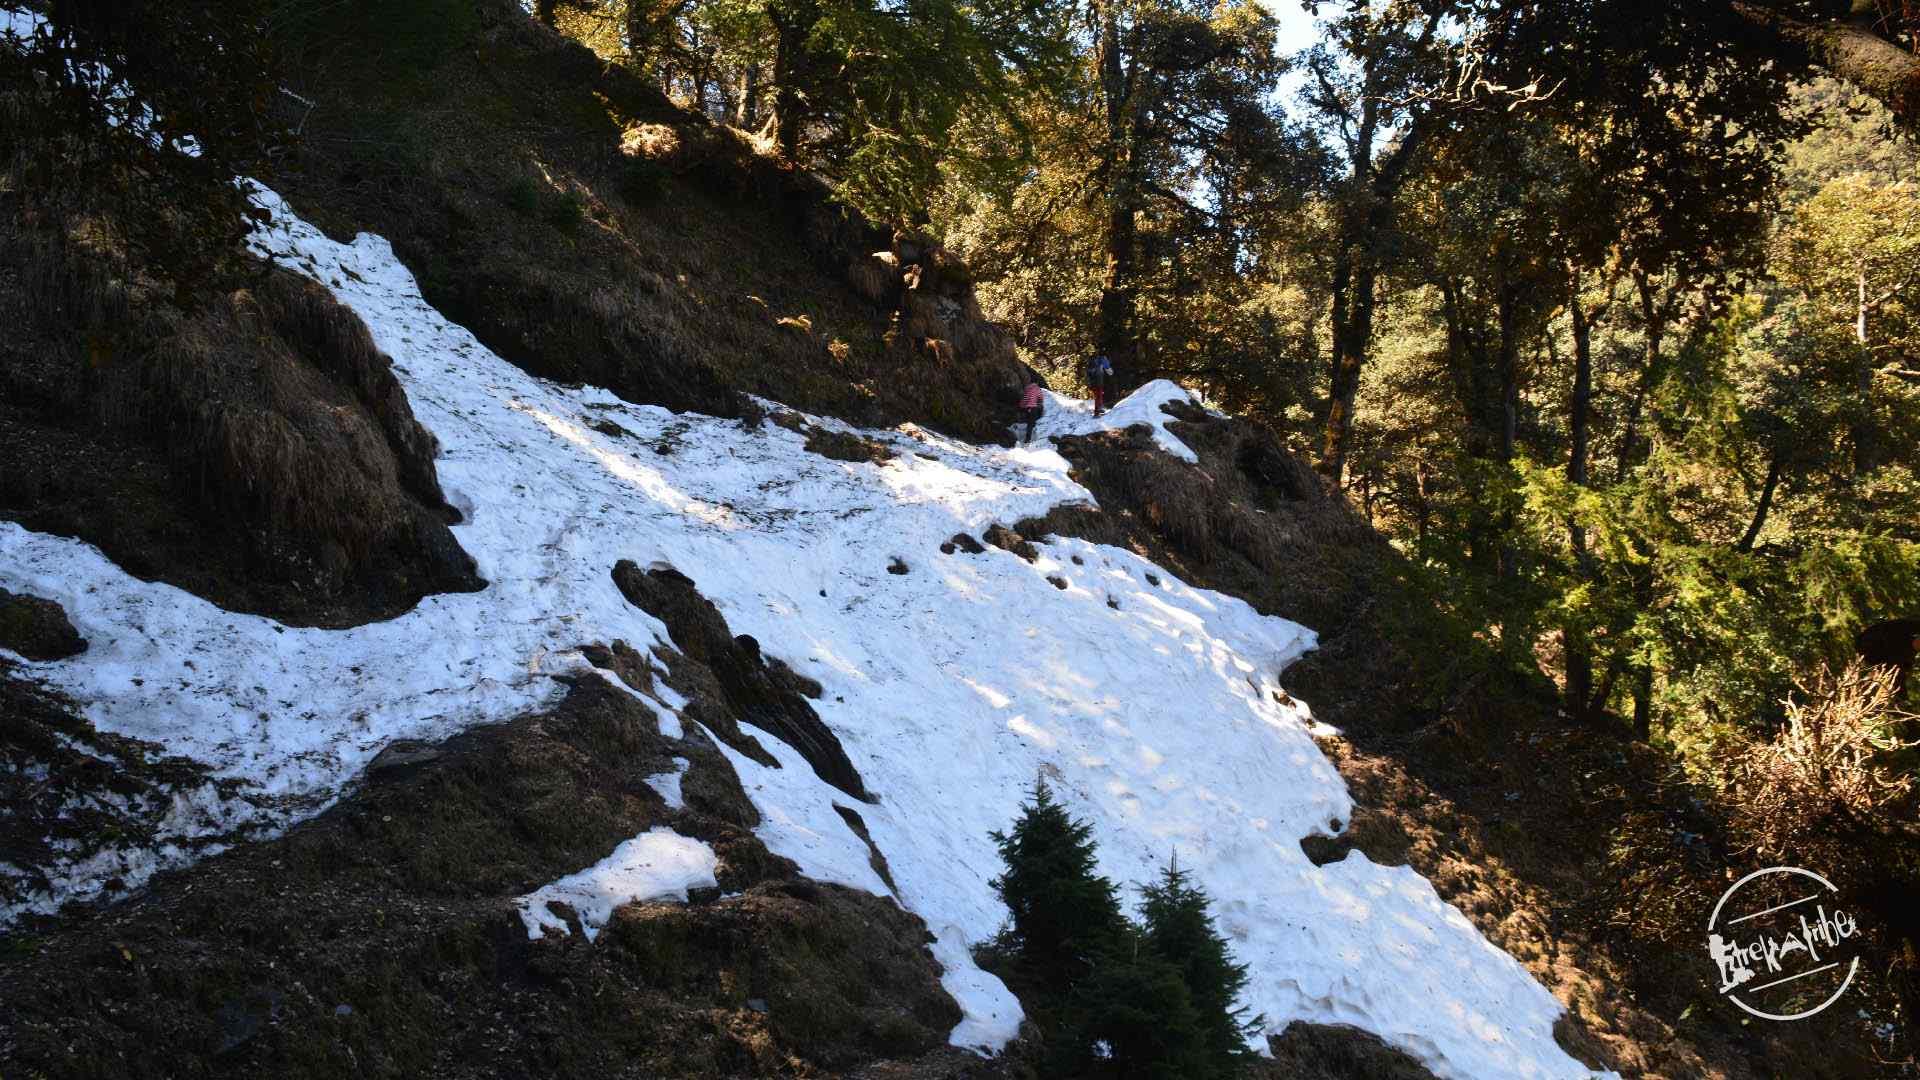 thachi valley mandi, himachal (13)